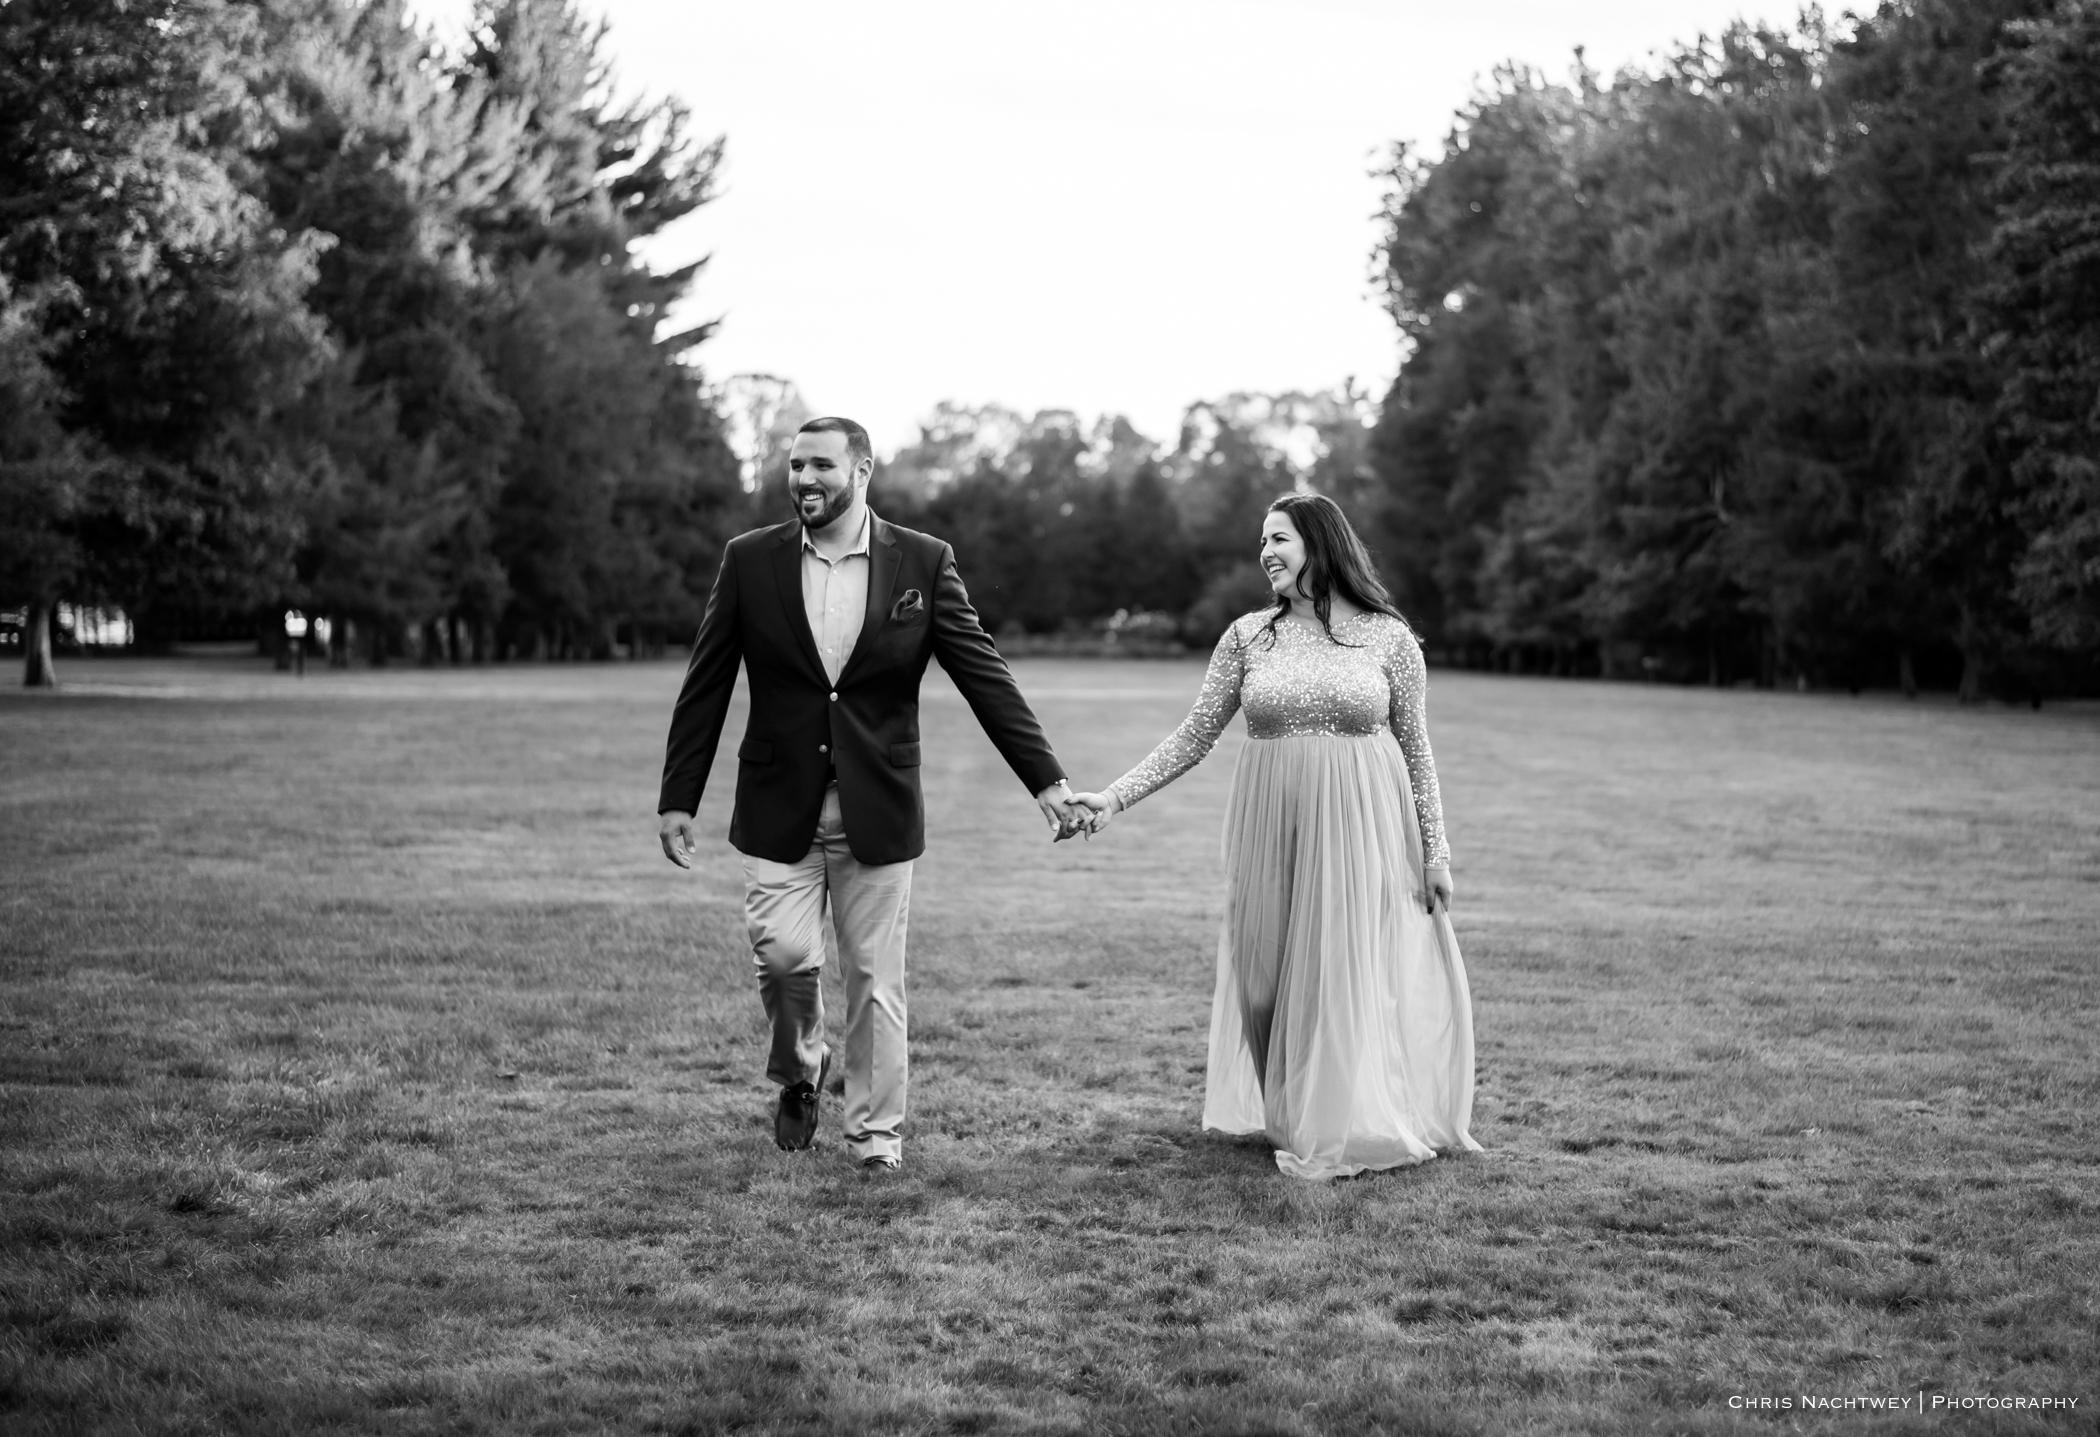 engagement-photos-wadsworth-mansion-ct-chris-nachtwey-photography-2017-5.jpg